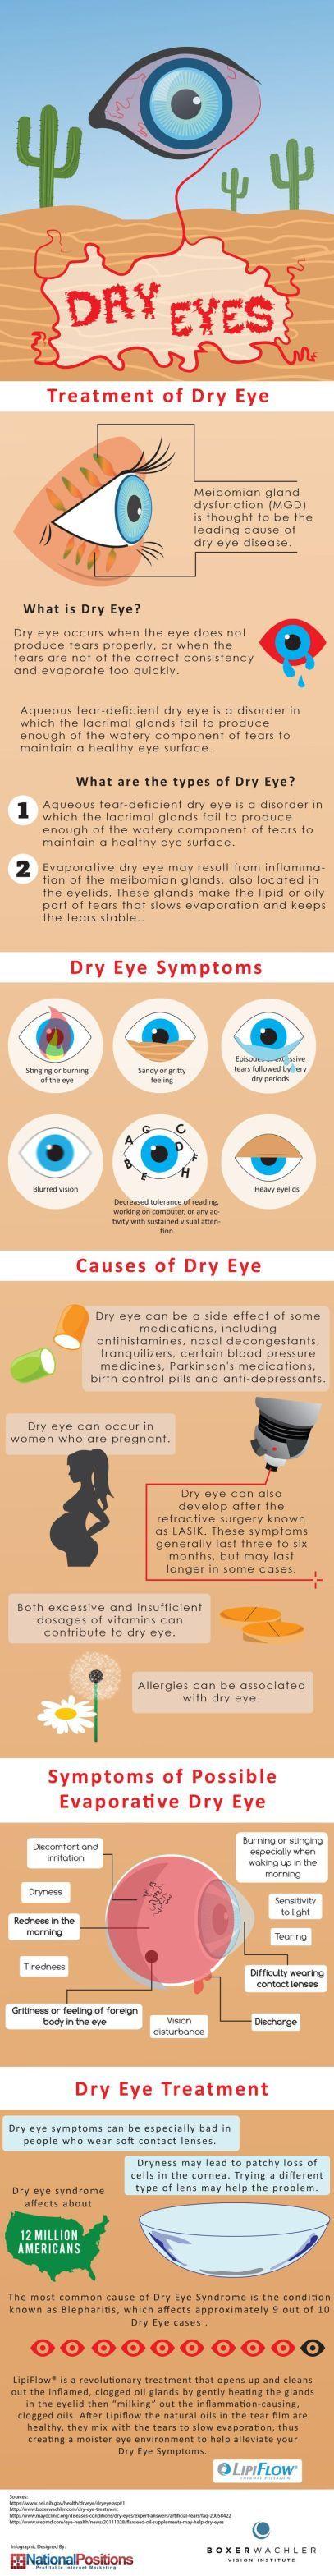 Dry Eye: Causes of Dry Eye